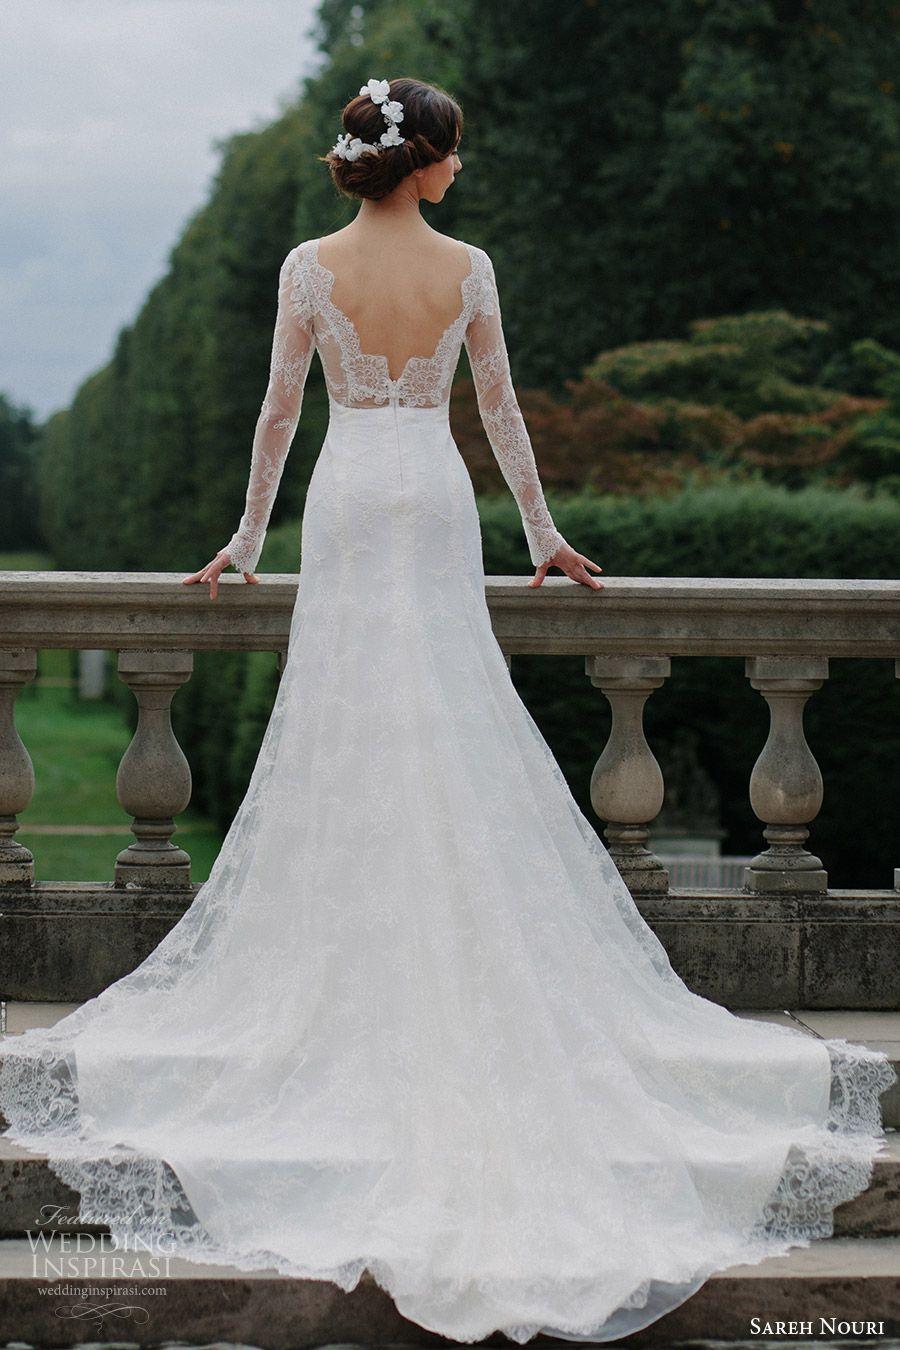 6410c02289de sareh nouri bridal fall 2016 long sleeves sweetheart illusion jewel neck  lace wedding dress (miriam) bv train elegant romantic